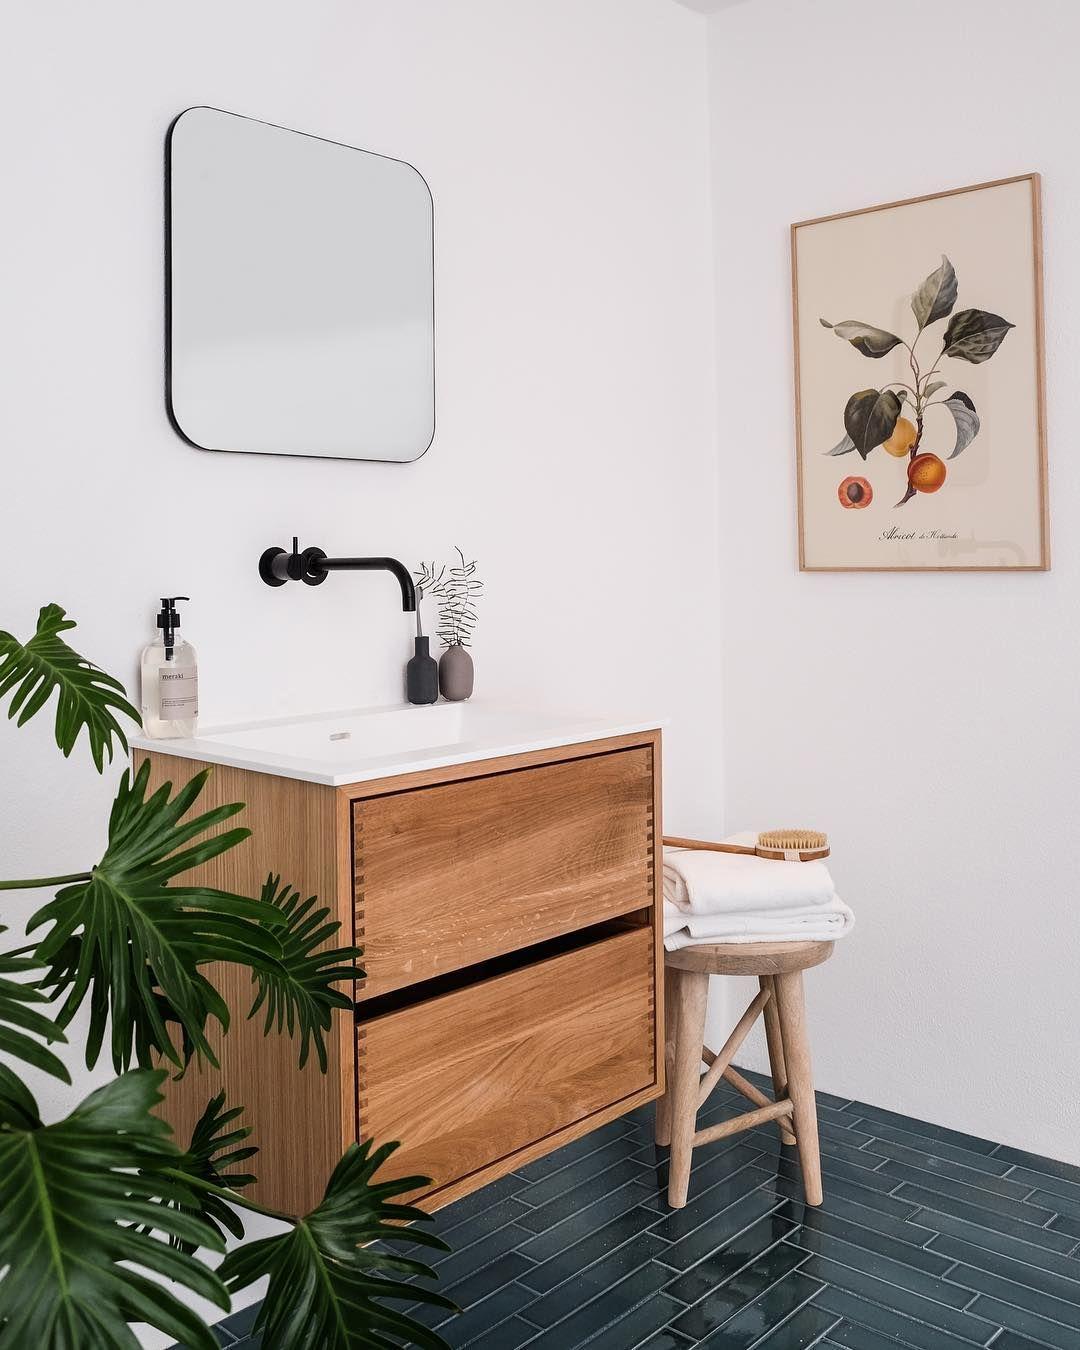 "Vellidte Focus Plus Aps on Instagram: ""Snedkerlavet badeværelsesmøbel i eg LG-78"